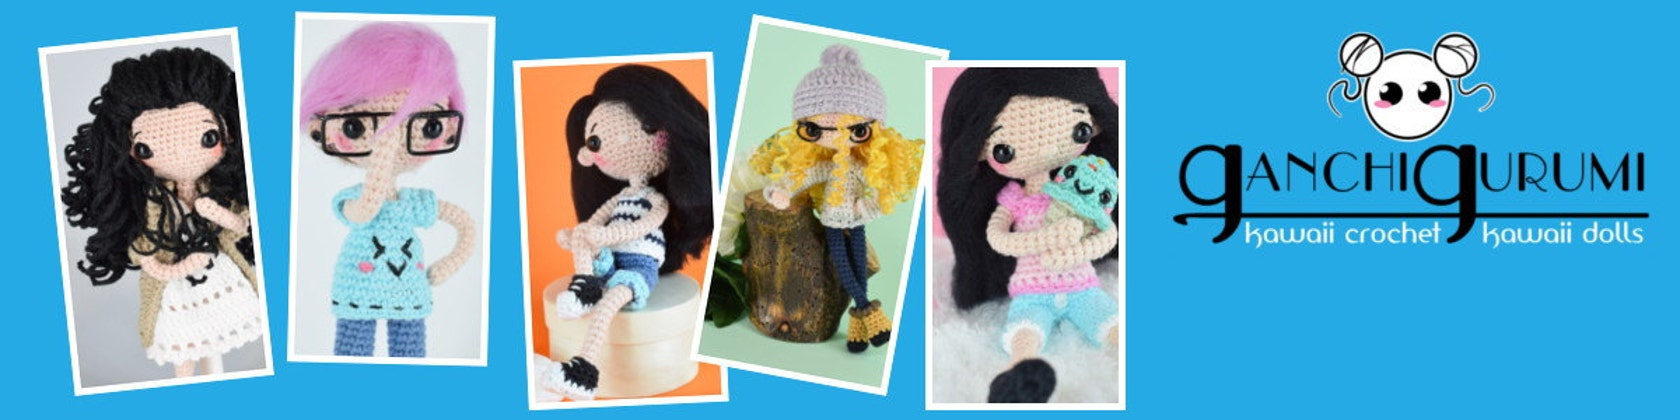 Kawaii crochet. Kawaii dolls por GanchiGurumi en Etsy